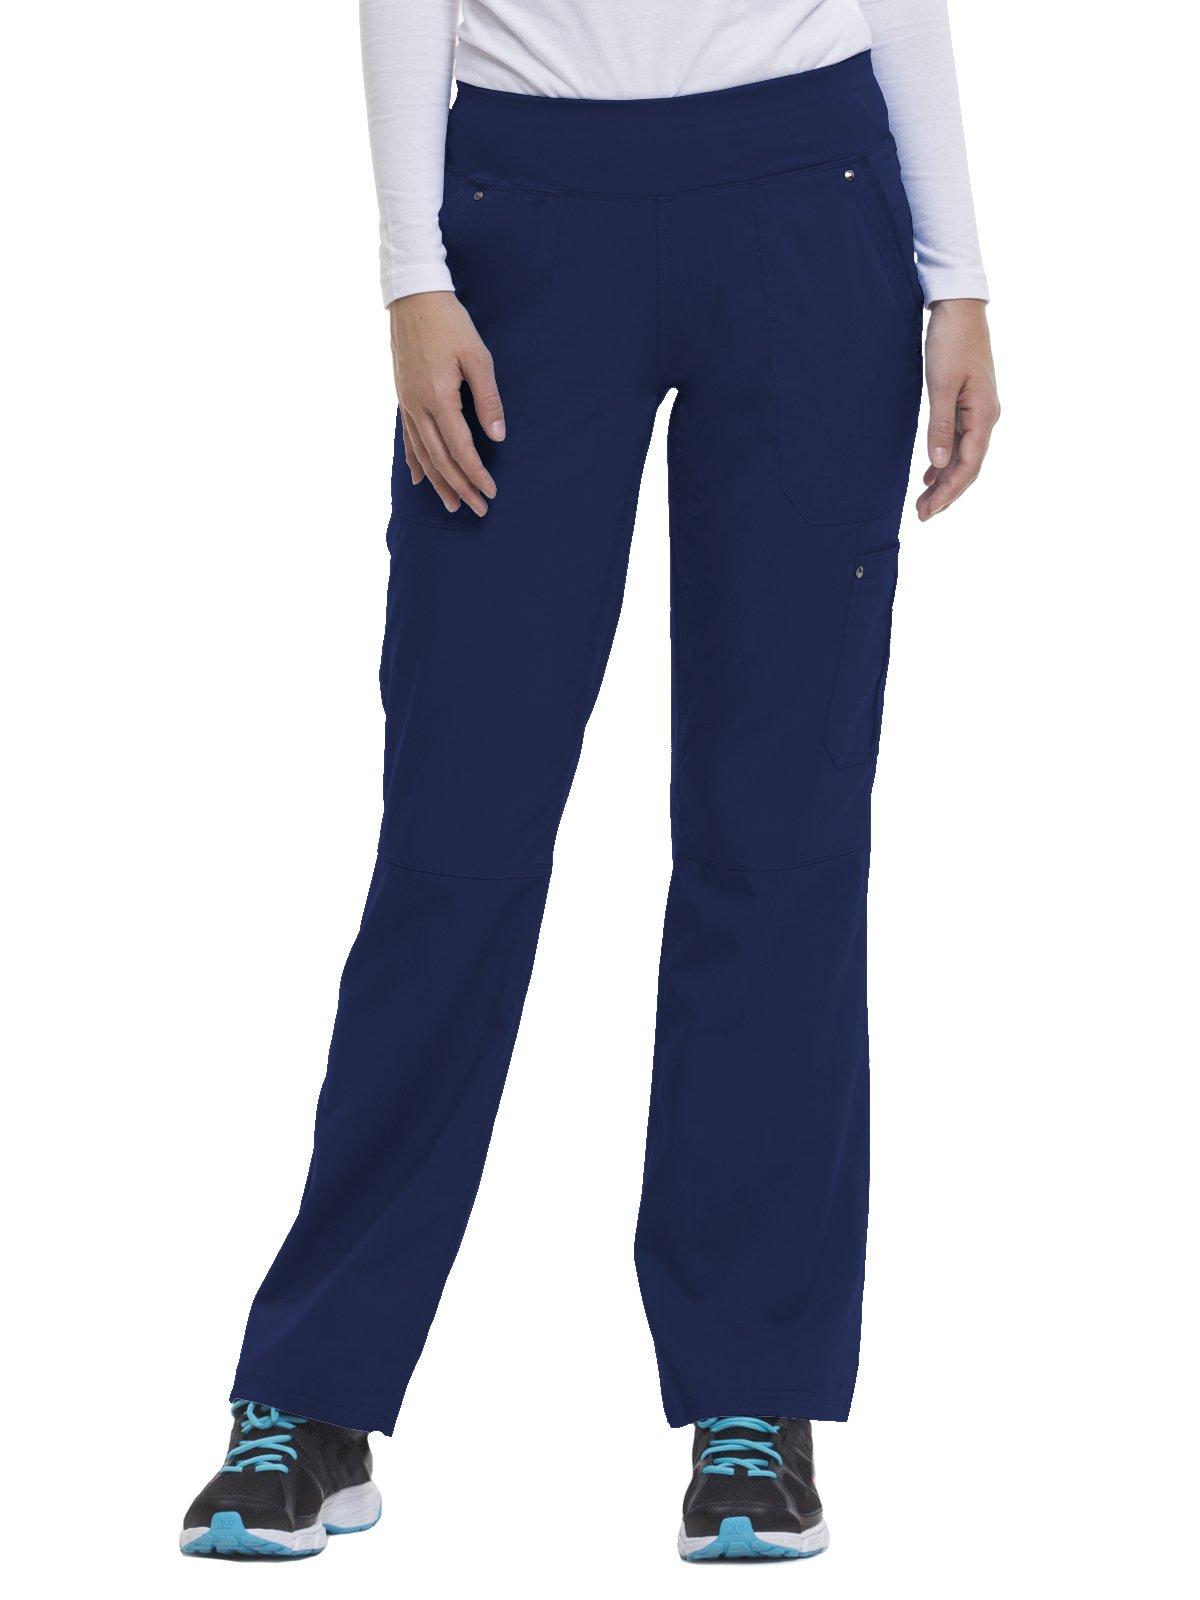 Purple Label by Healing Hands Scrubs Women's''Tori'' 9133 5 Pocket Knit Waist Pant Navy- Large